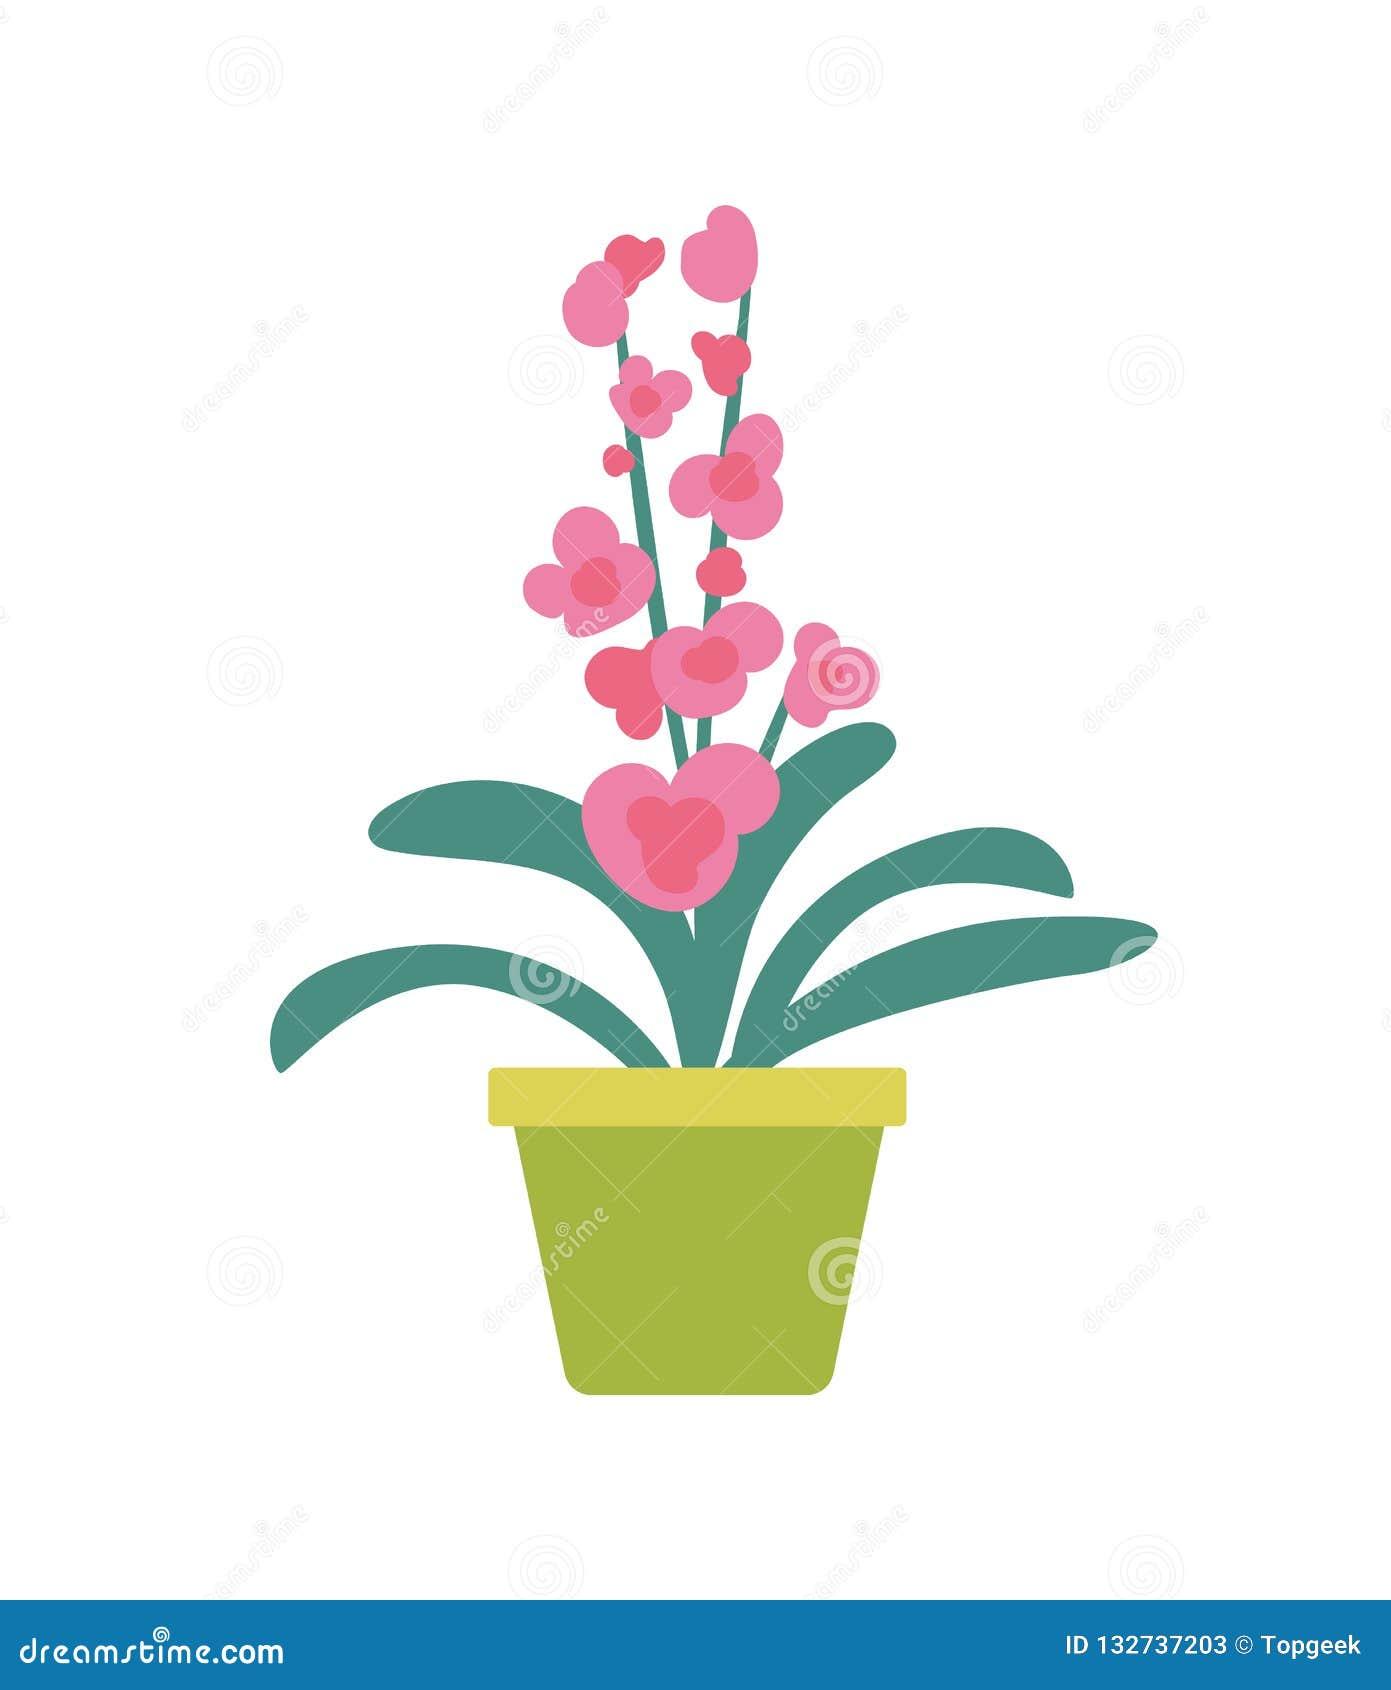 Houseplant απομονωμένο στο Flowerpot έμβλημα κινούμενων σχεδίων